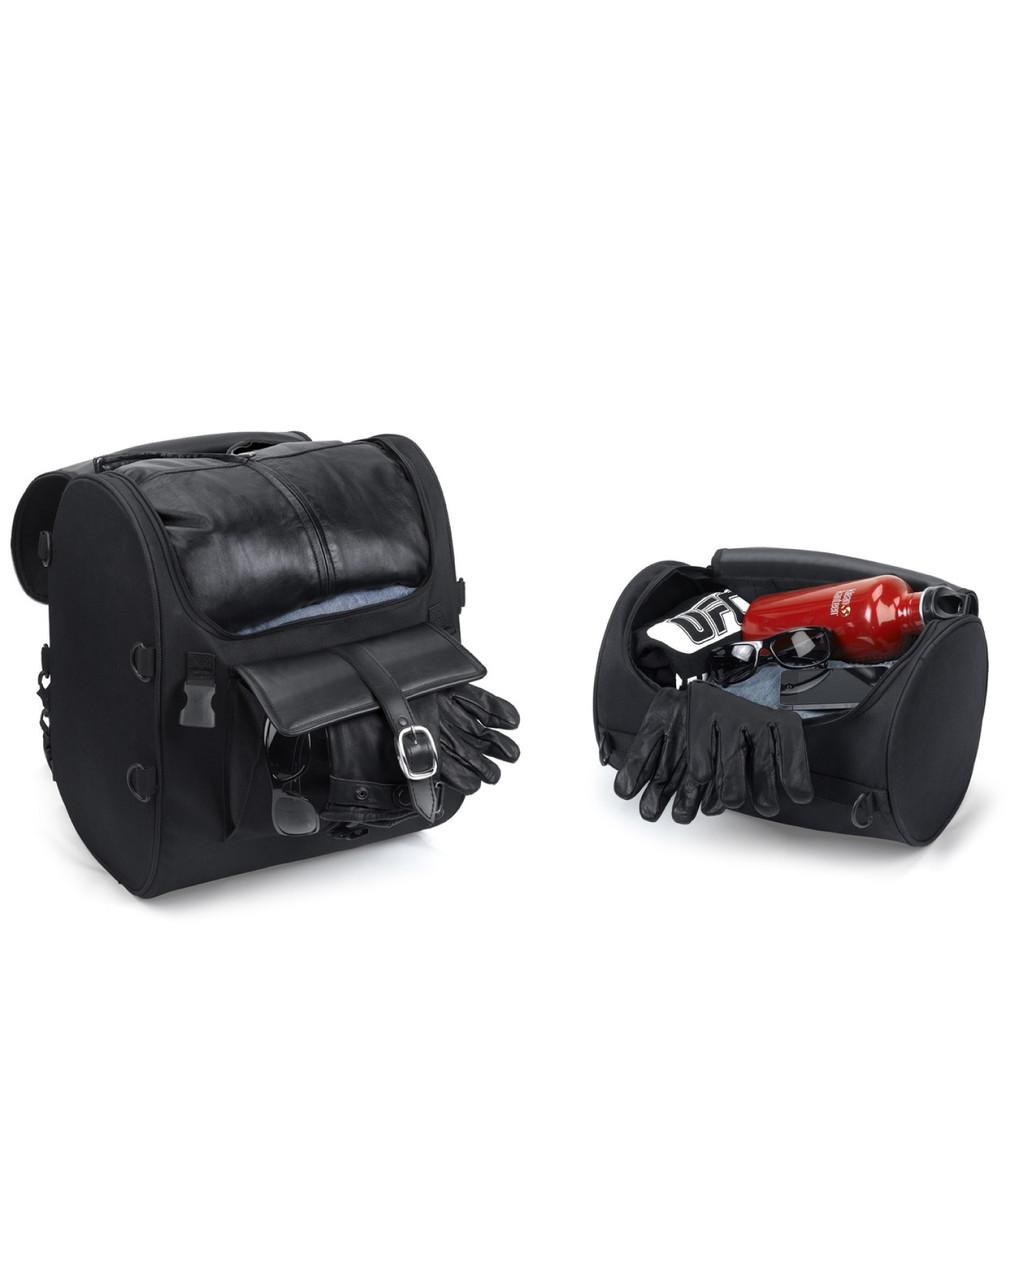 Honda Economy Line Motorcycle Sissy Bar Bag Storage View